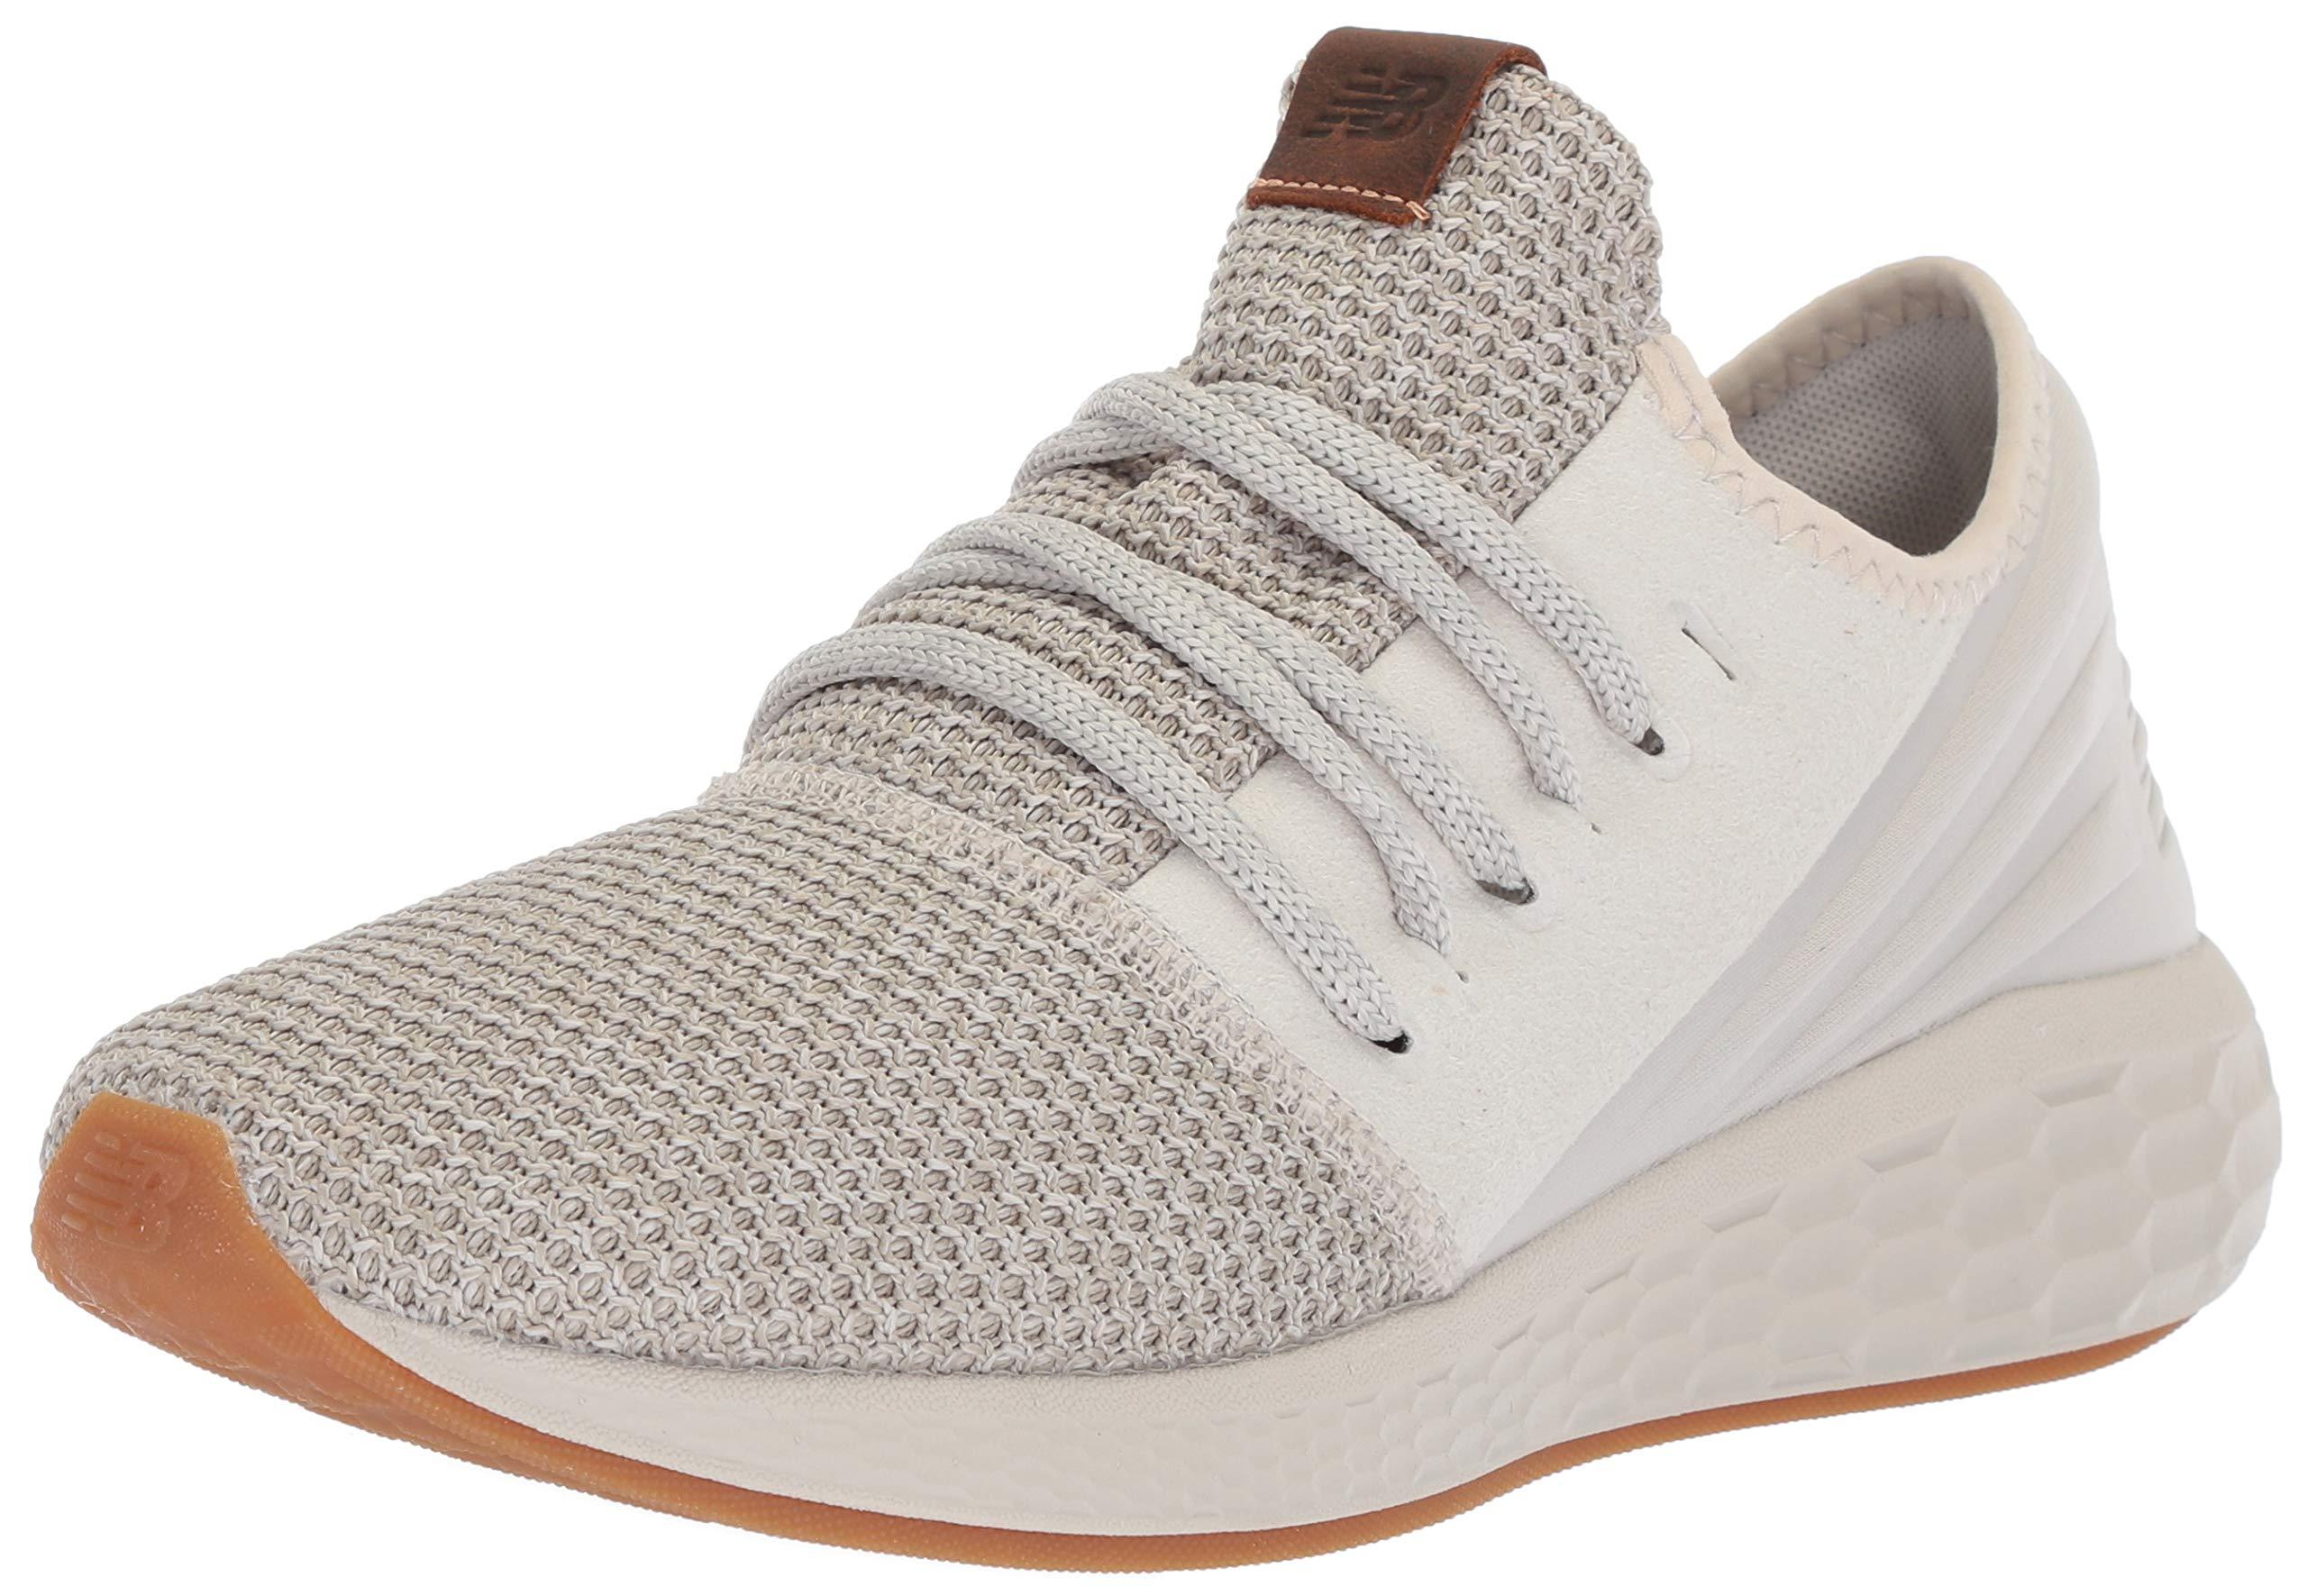 6976e822dac0 Galleon - New Balance Men s Cruz V2 Fresh Foam Running Shoe ...